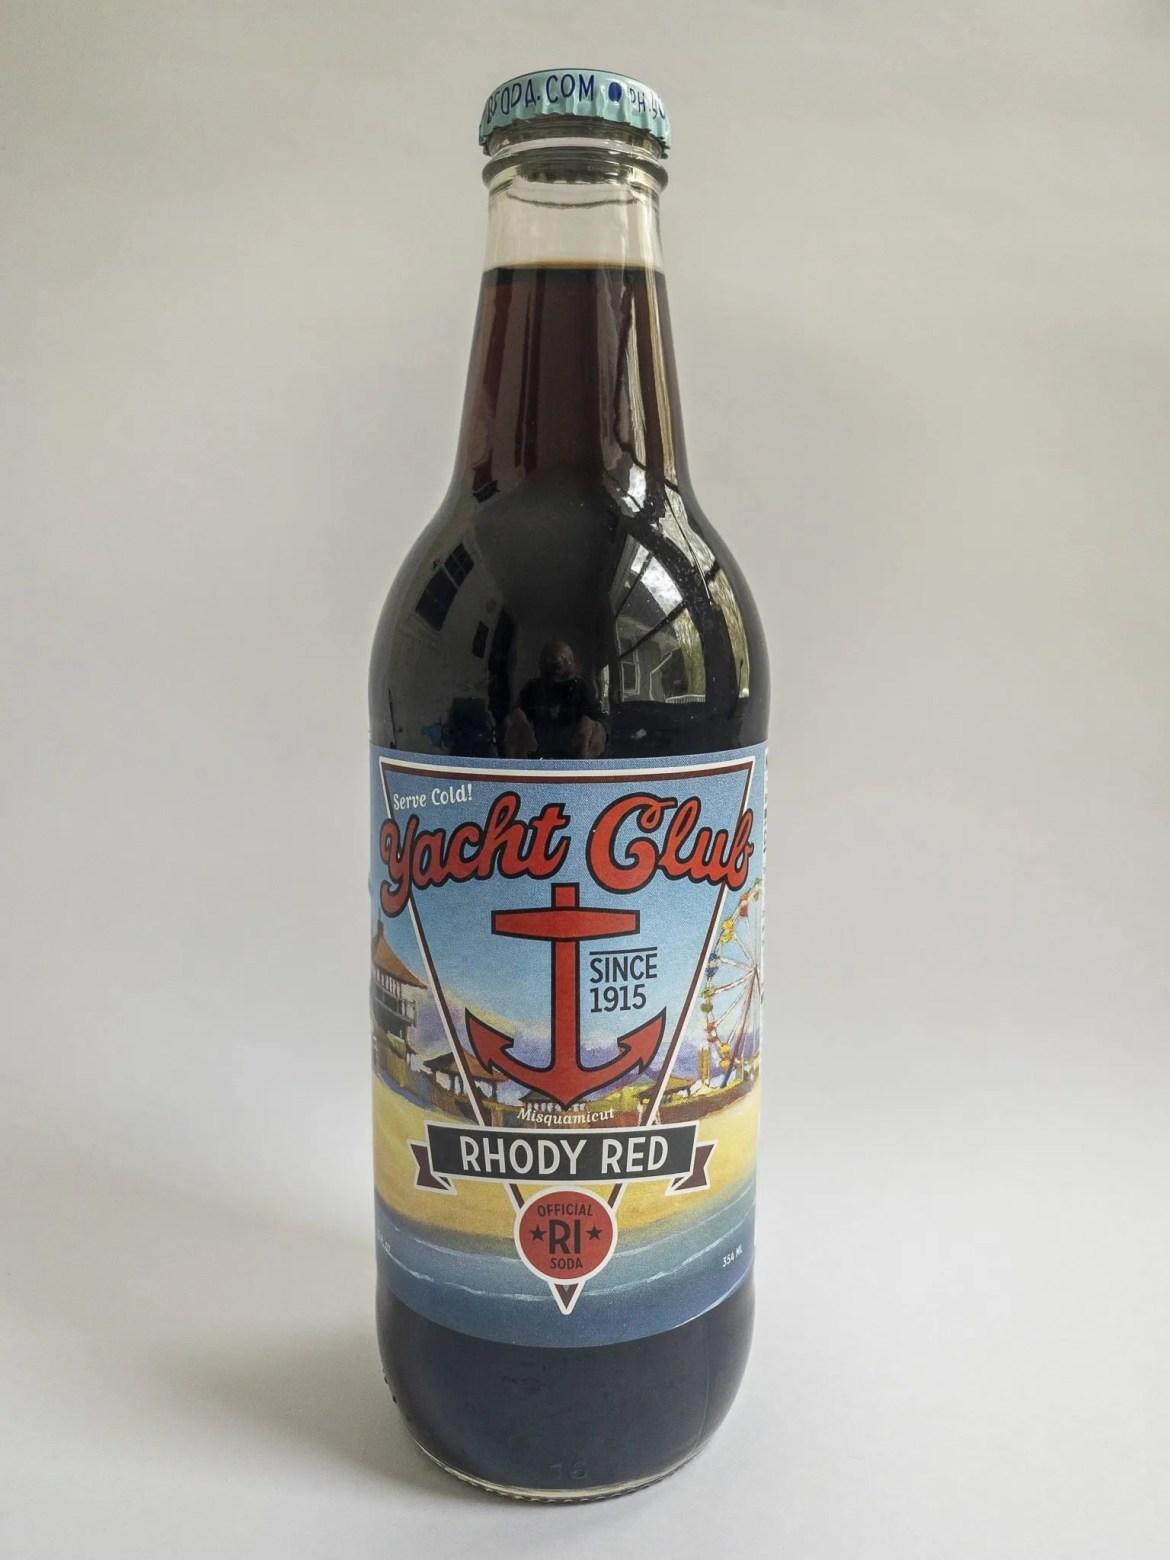 Yacht Club Bottling Works Rhody Red bottled